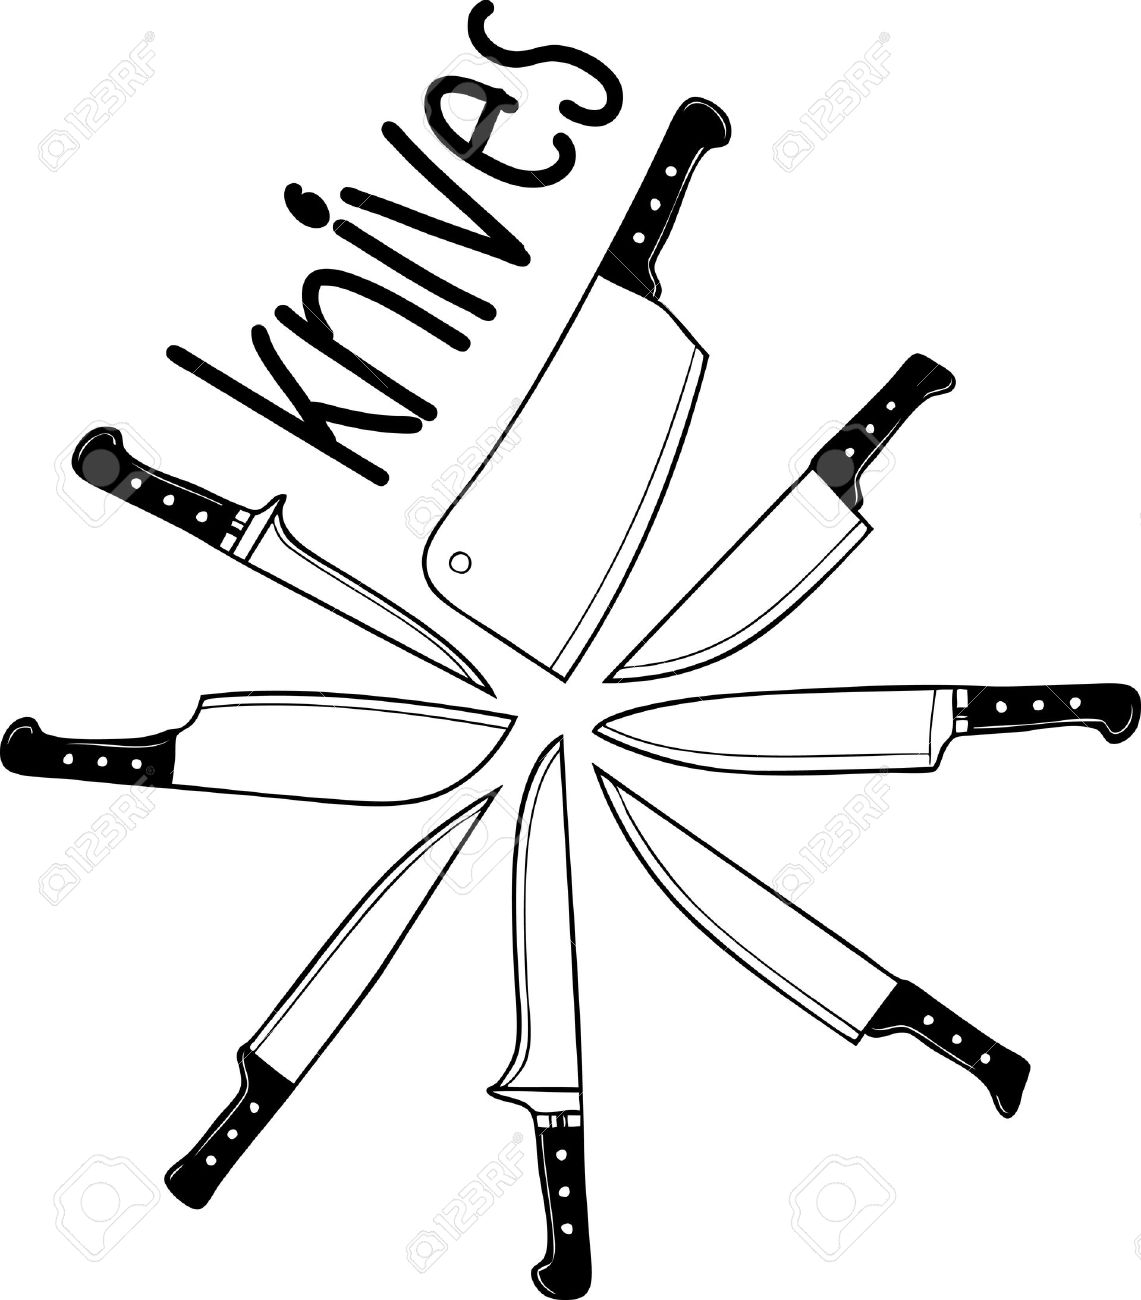 Chevy Symbol Drawing At Getdrawings